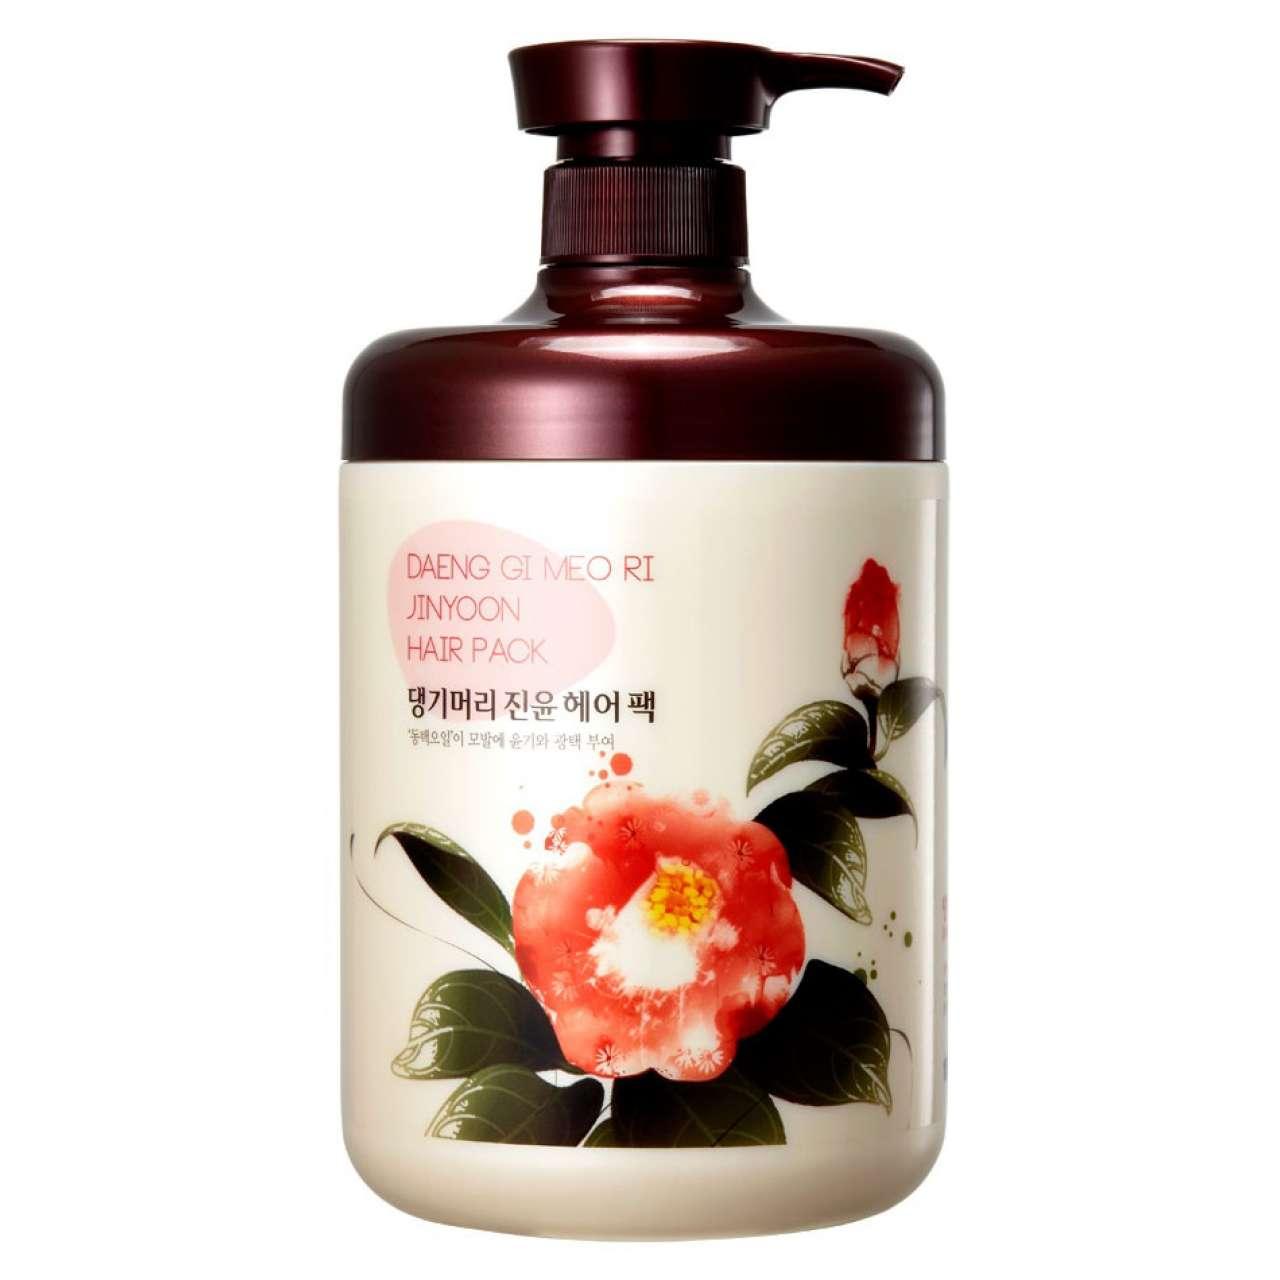 Daeng Gi Meo Ri JINYOON Маска для волос